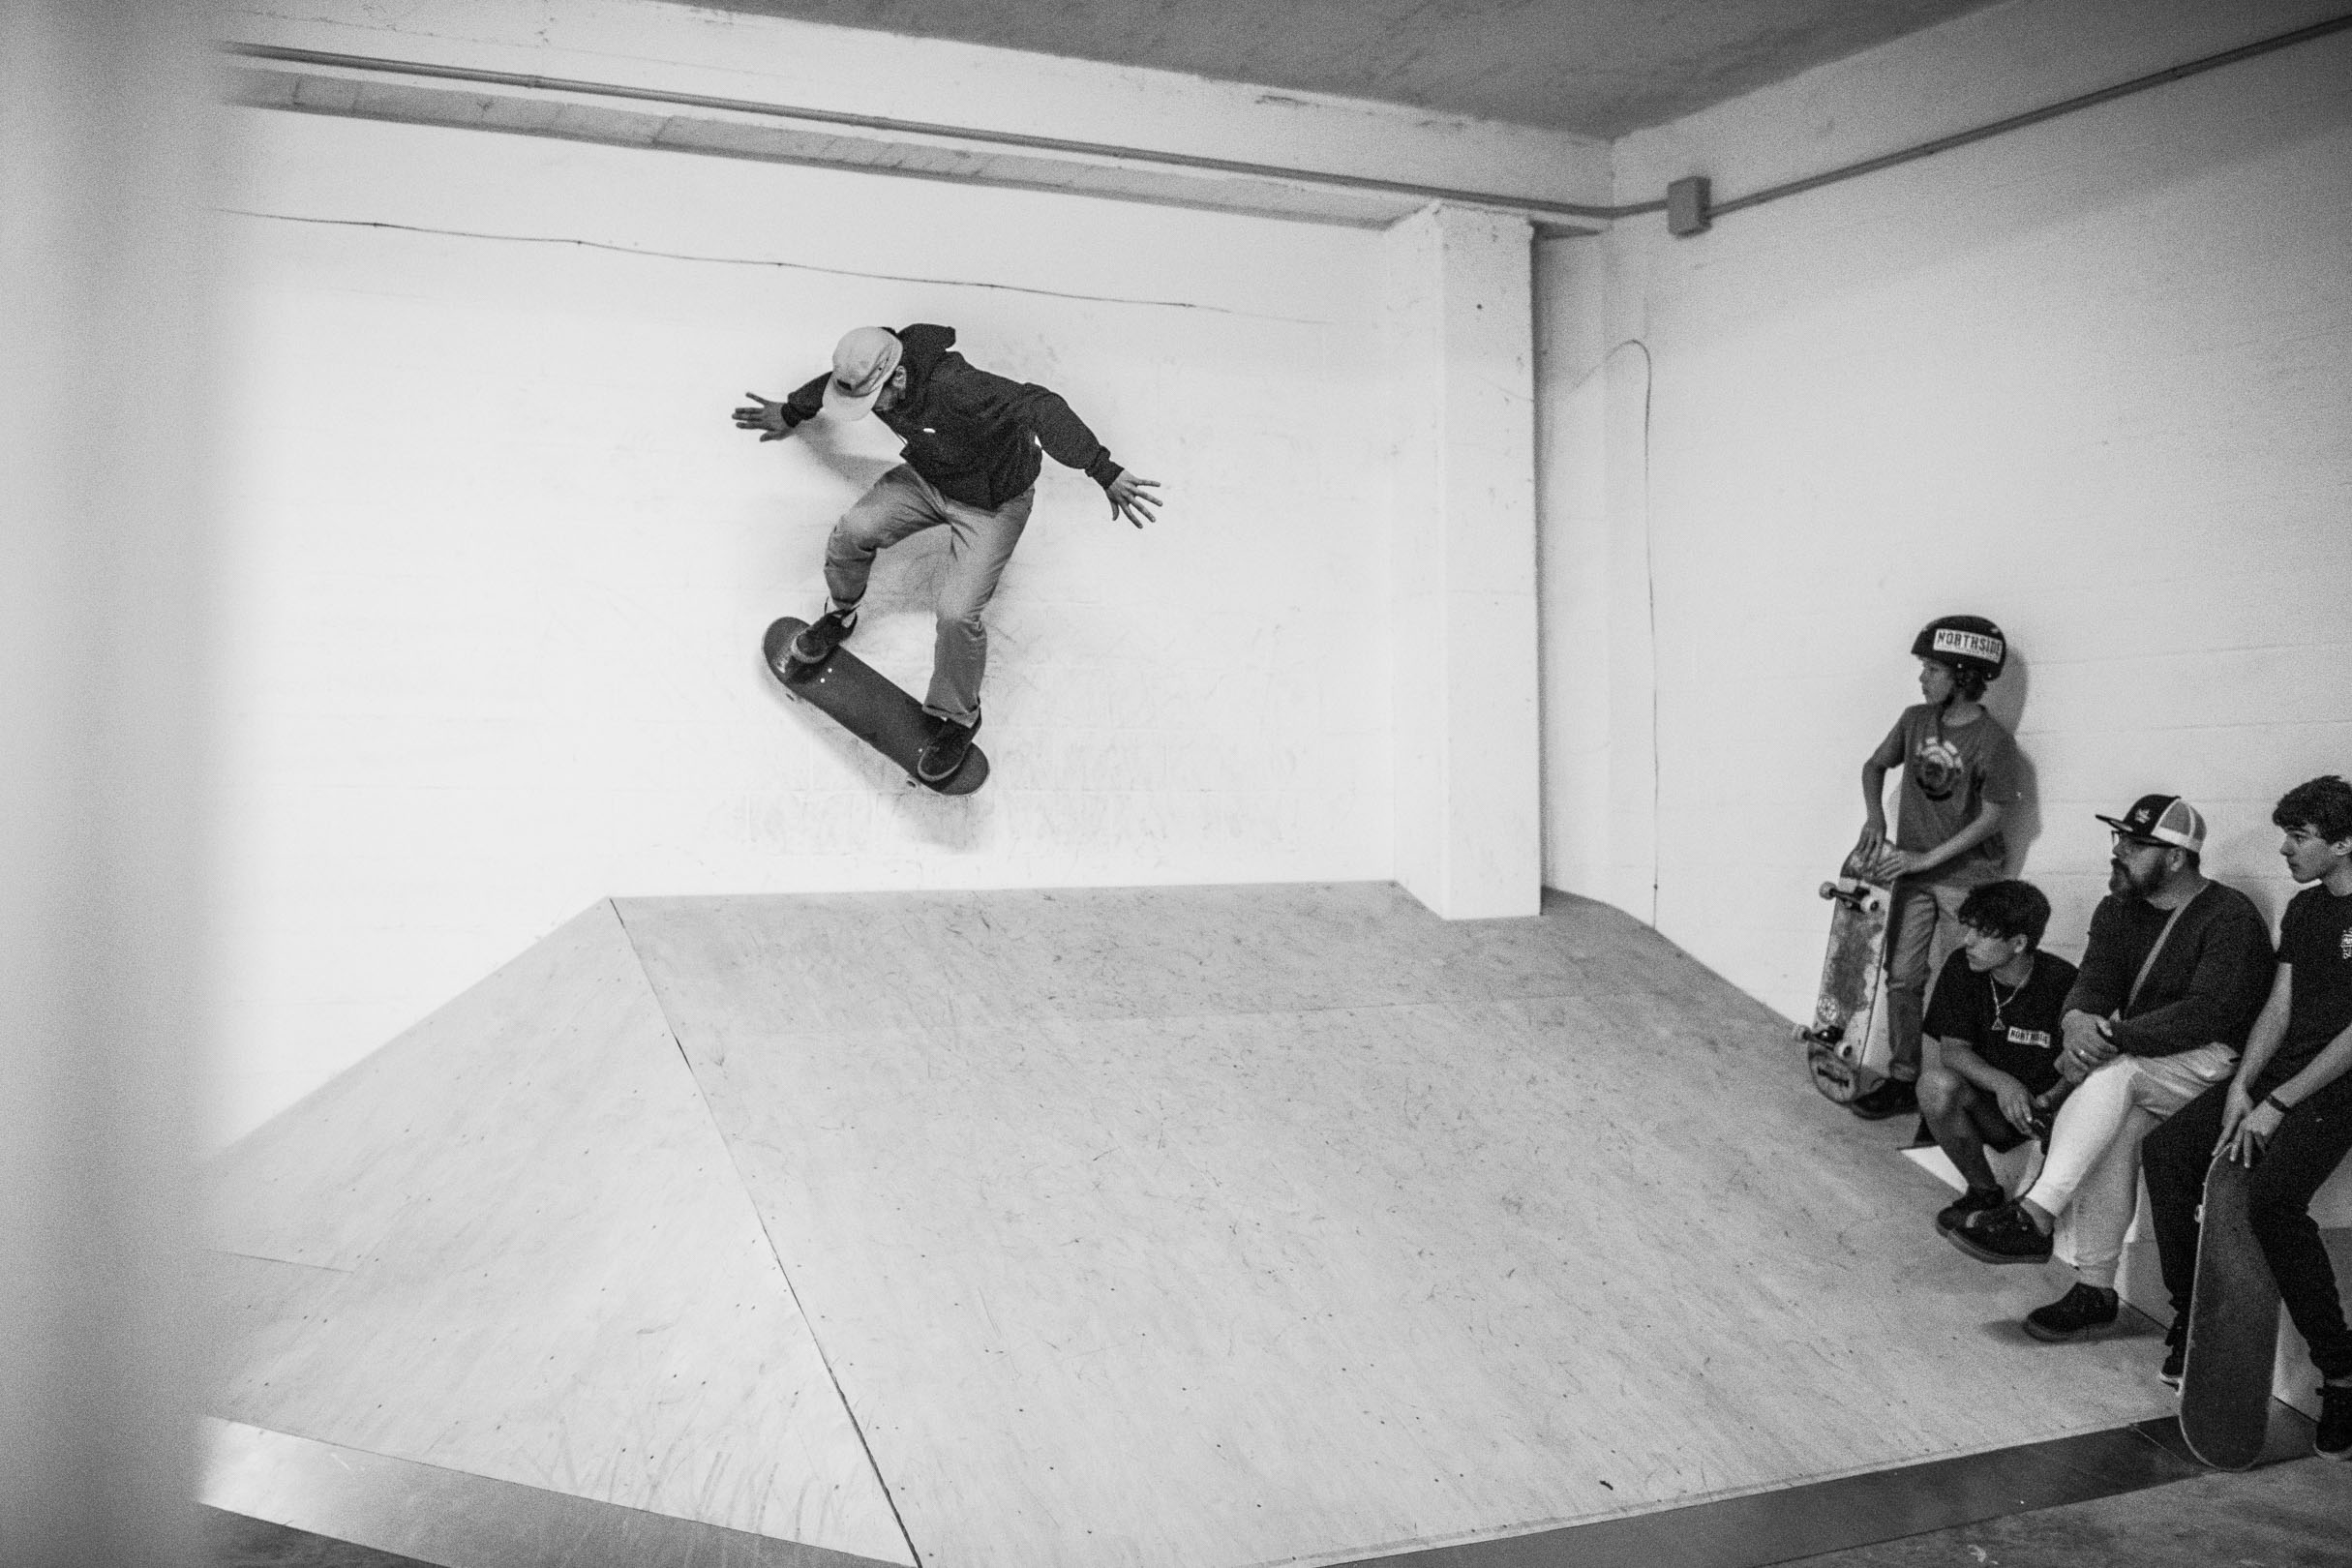 coruna-fotografia-skate-5.jpg